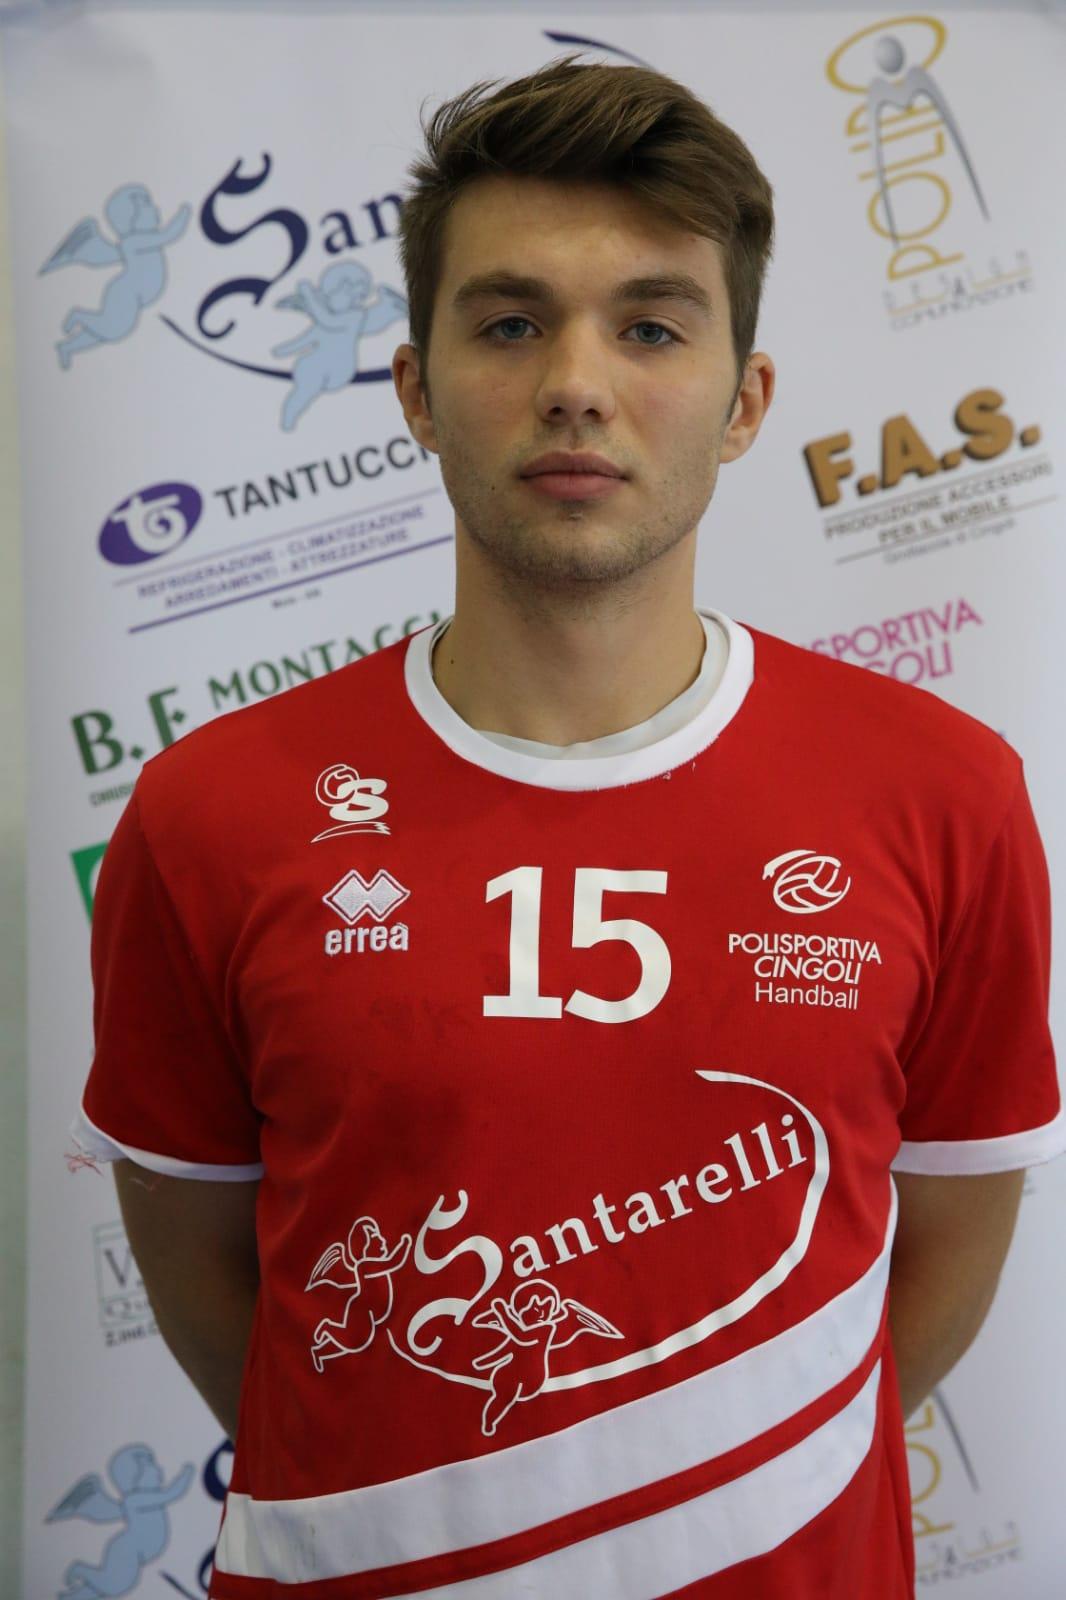 15 – Alexandru Rotaru : Terzino